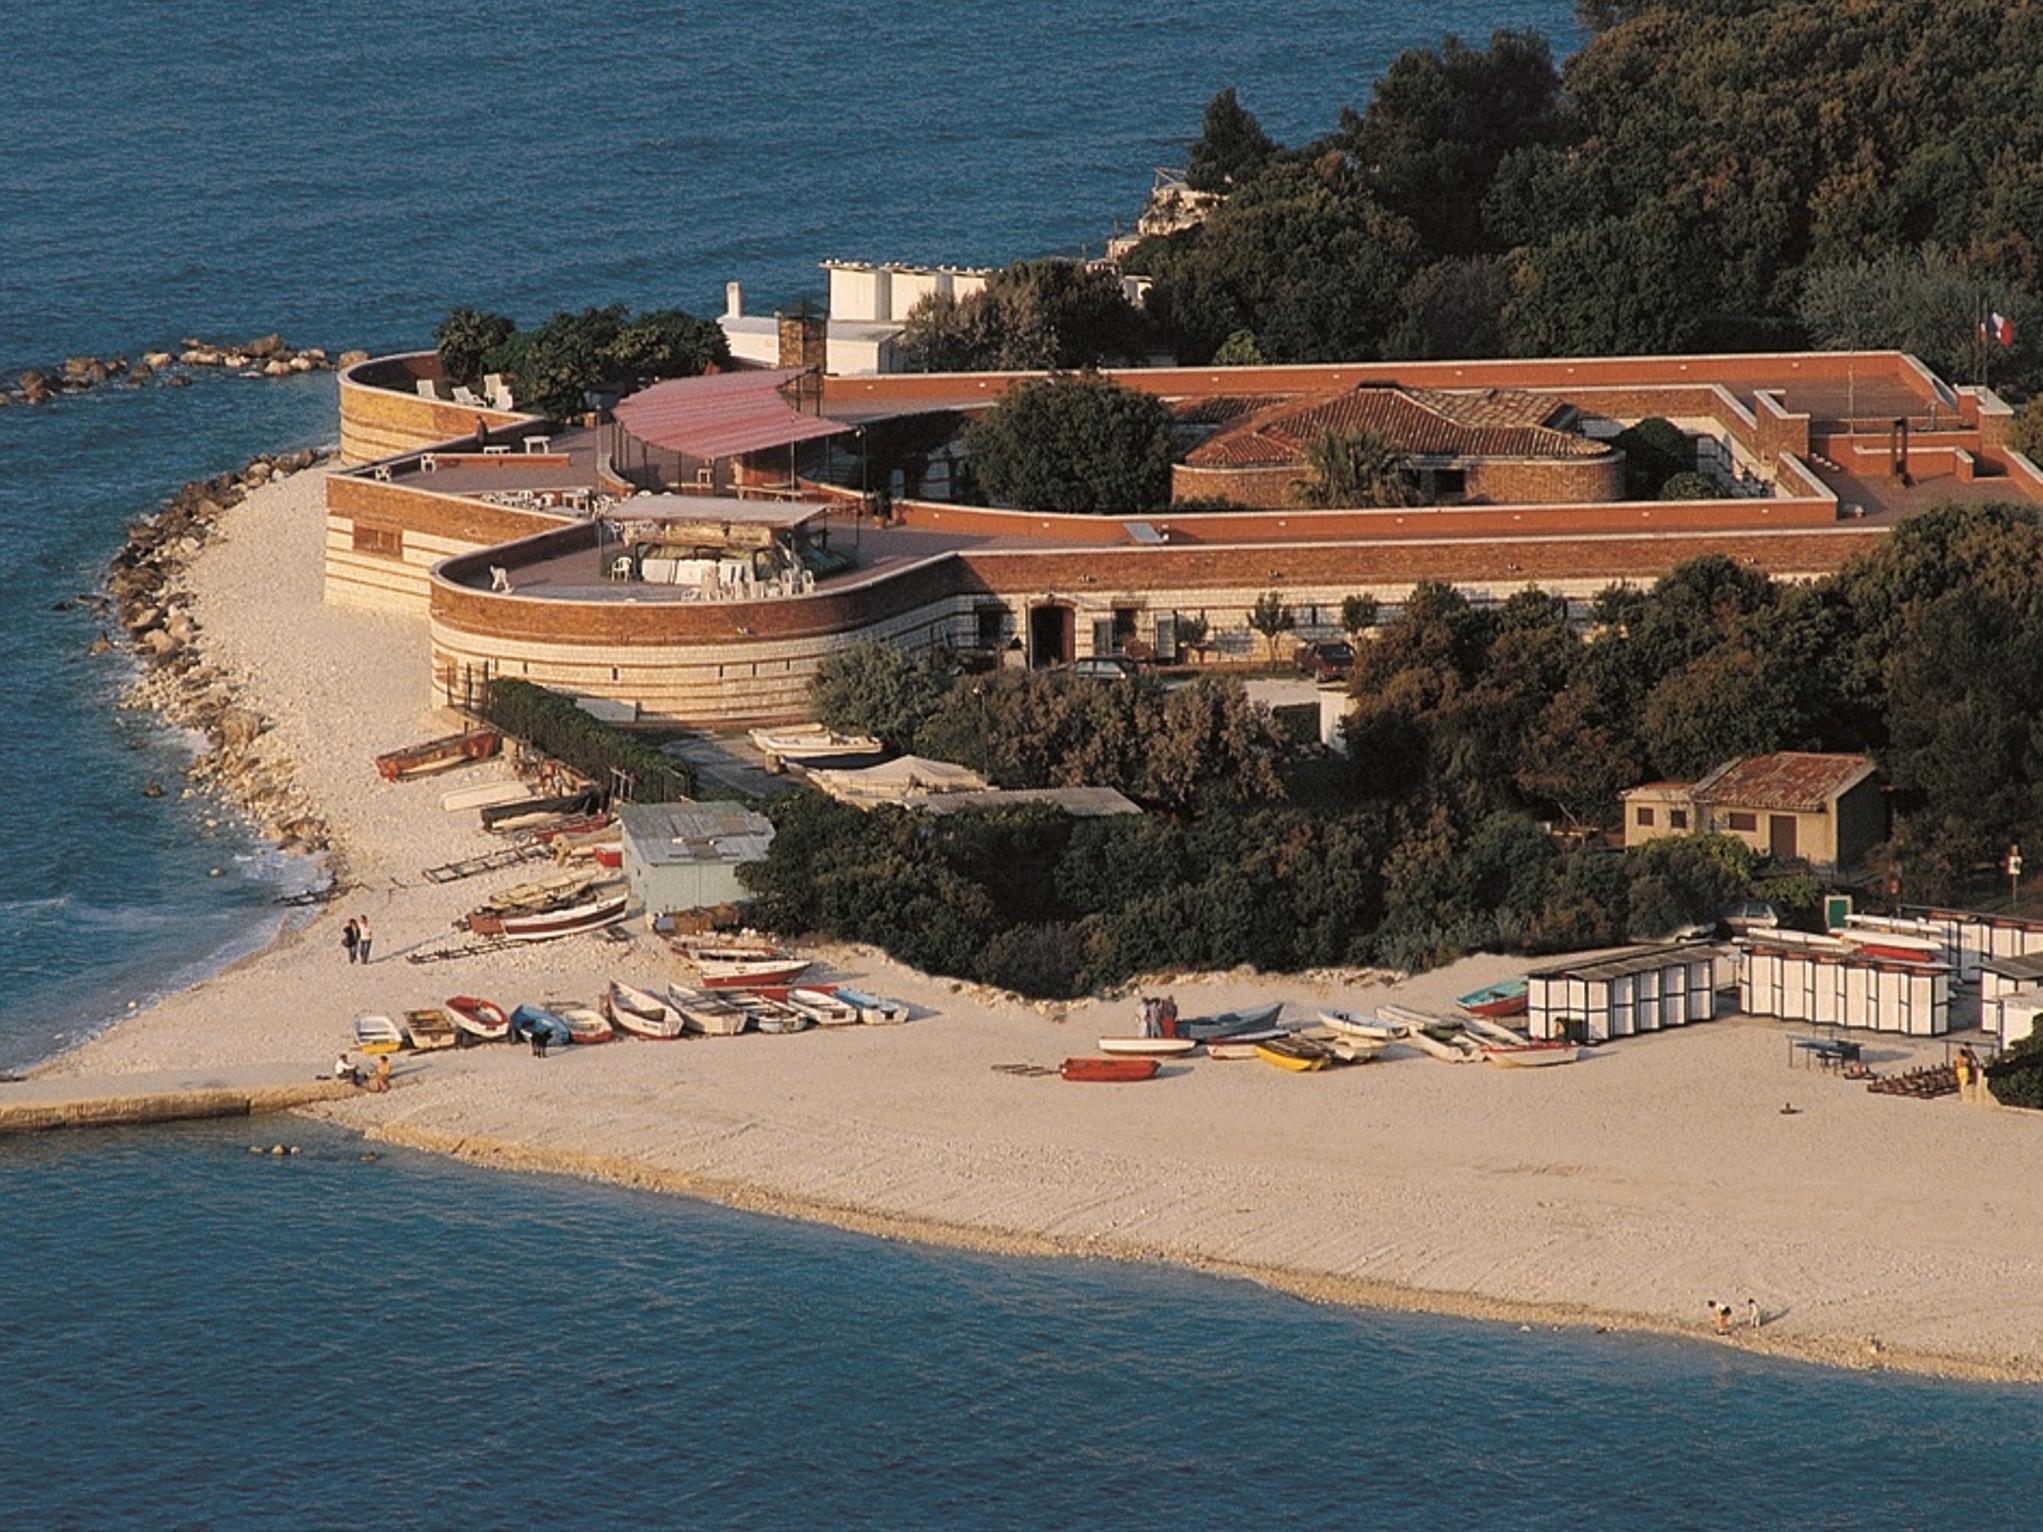 Hotel Fortino Napoleonico Ancona - View